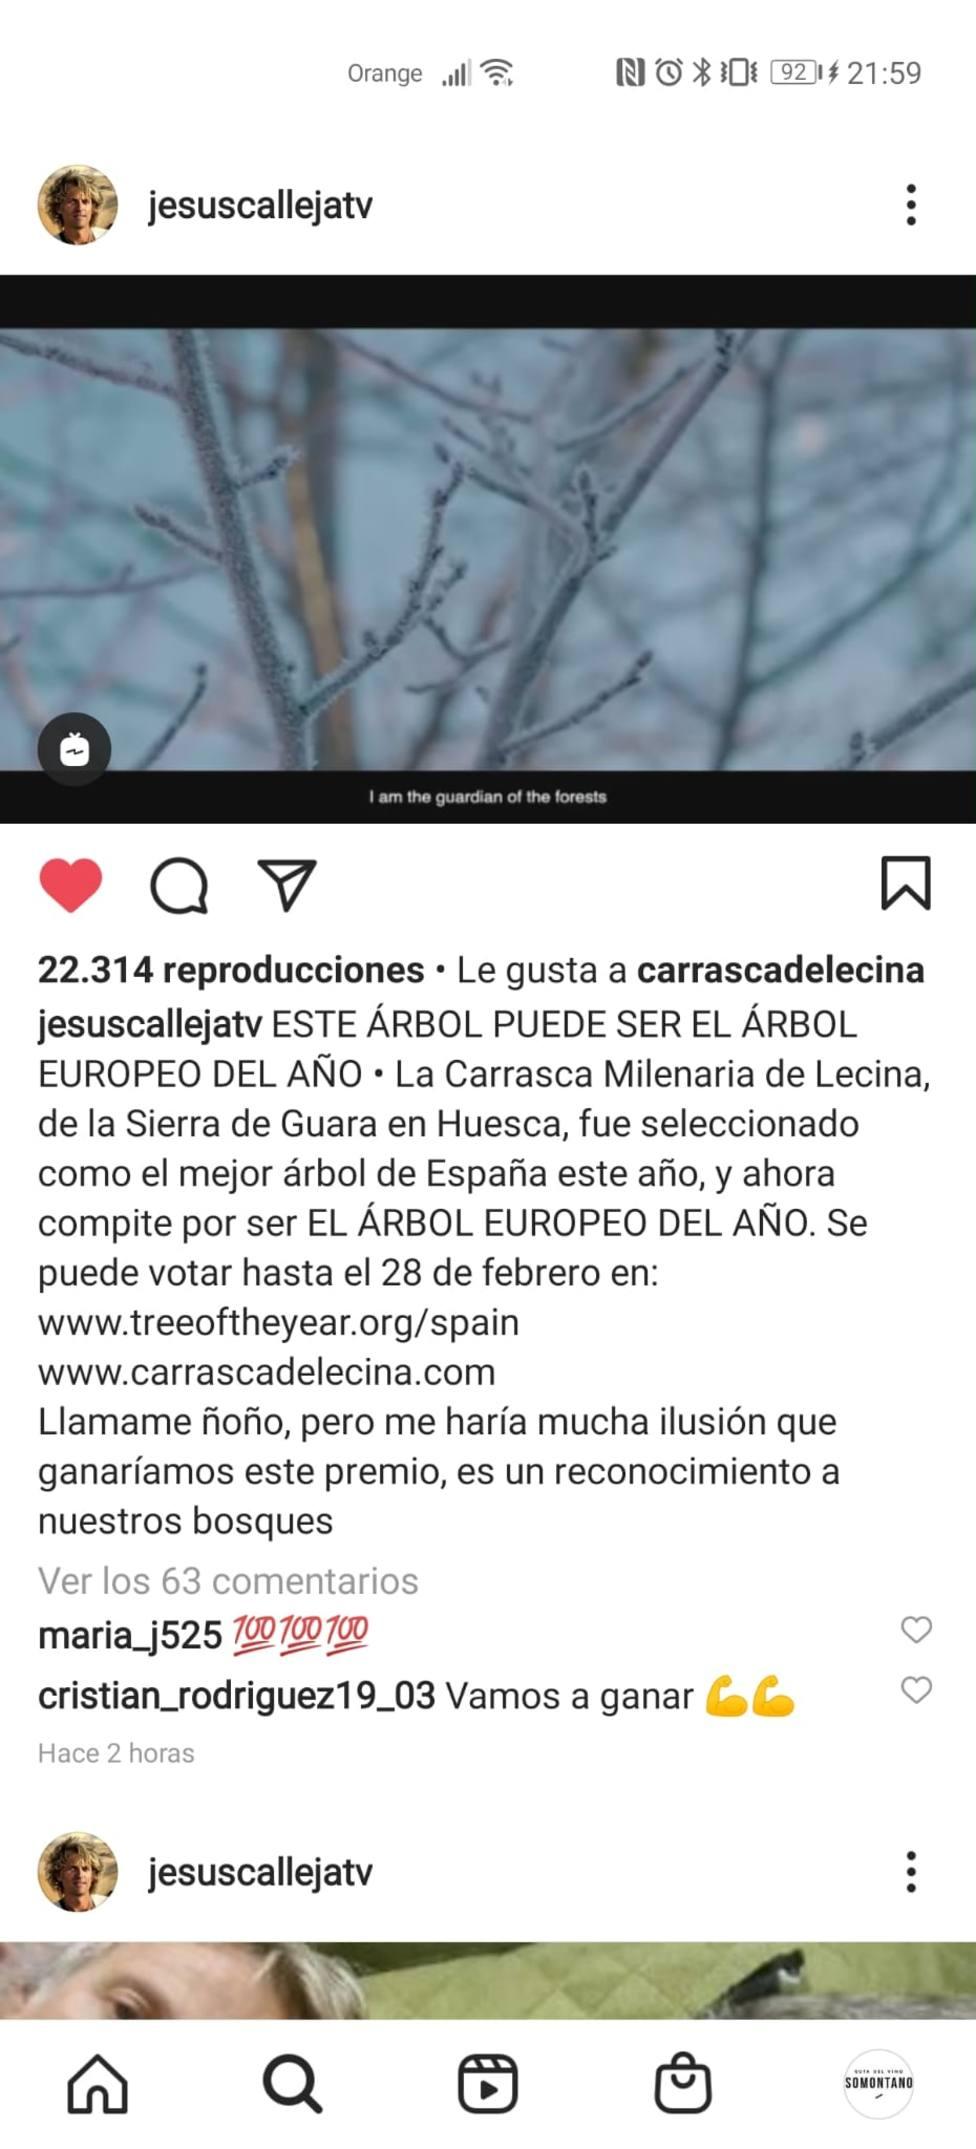 Jesús Calleja apoya carrasca Lecina